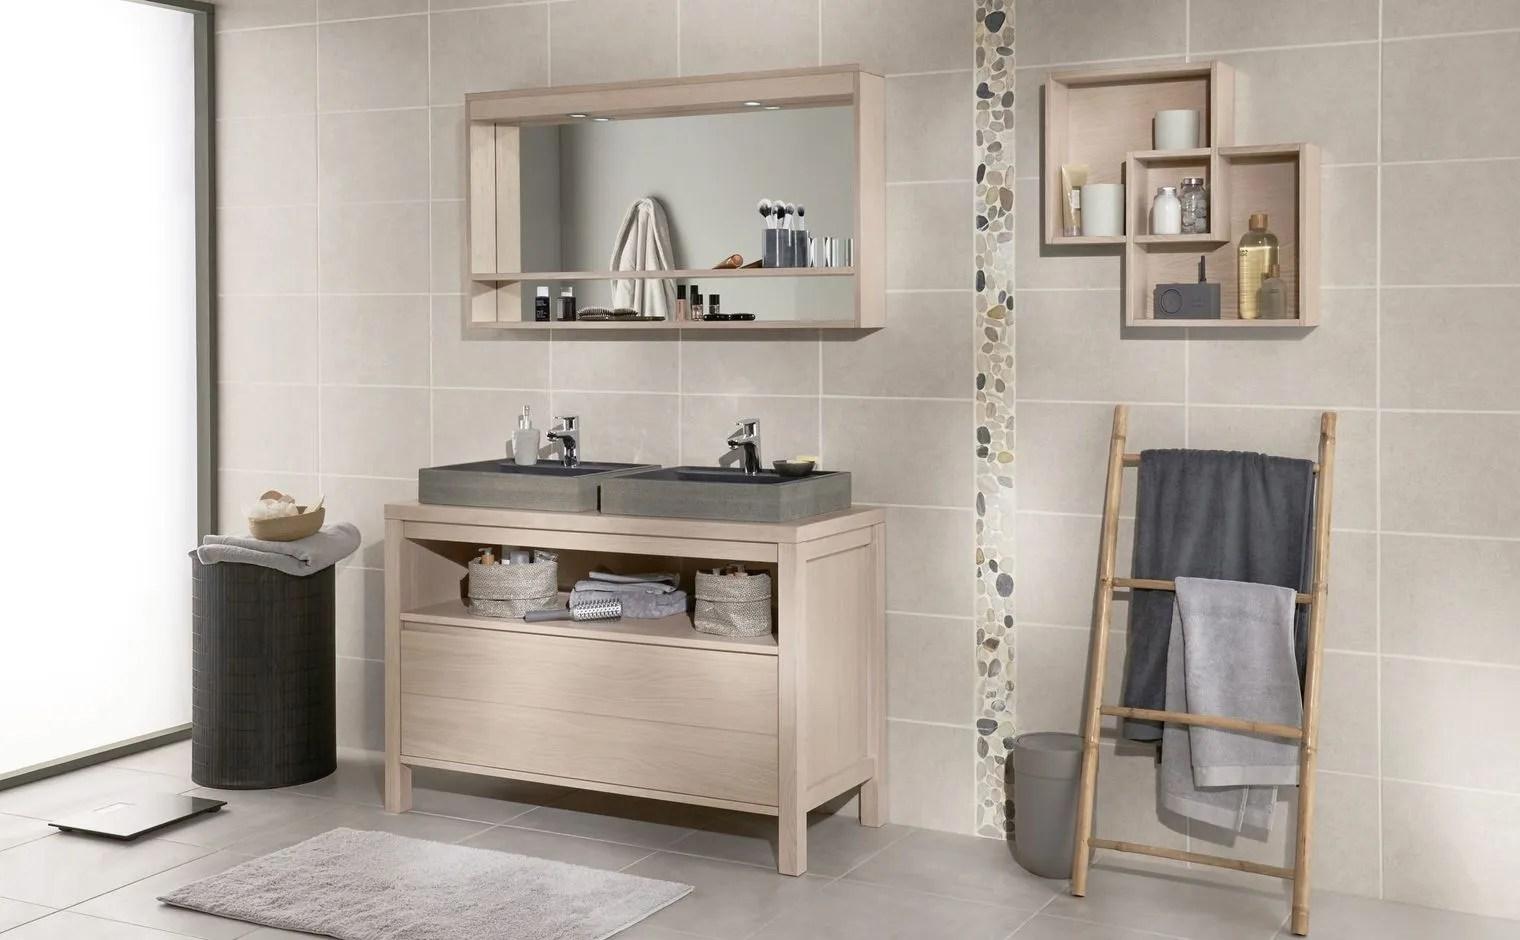 Salle de bain type industriel meuble salle de bain type for Meuble salle de bain bois et blanc